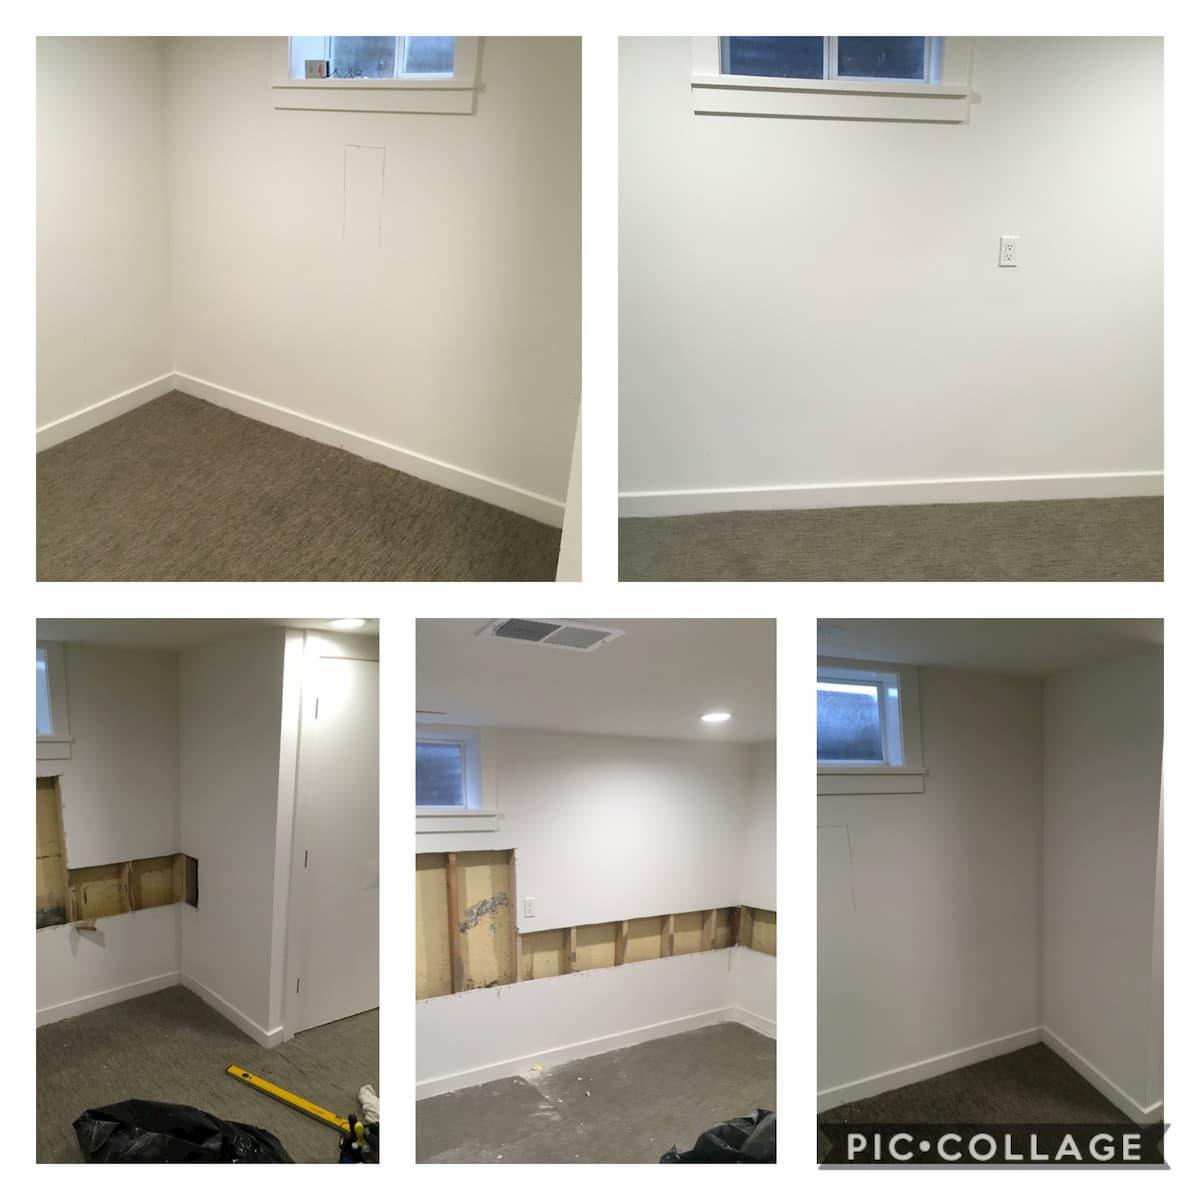 Mr. Handyman drywall repair services.